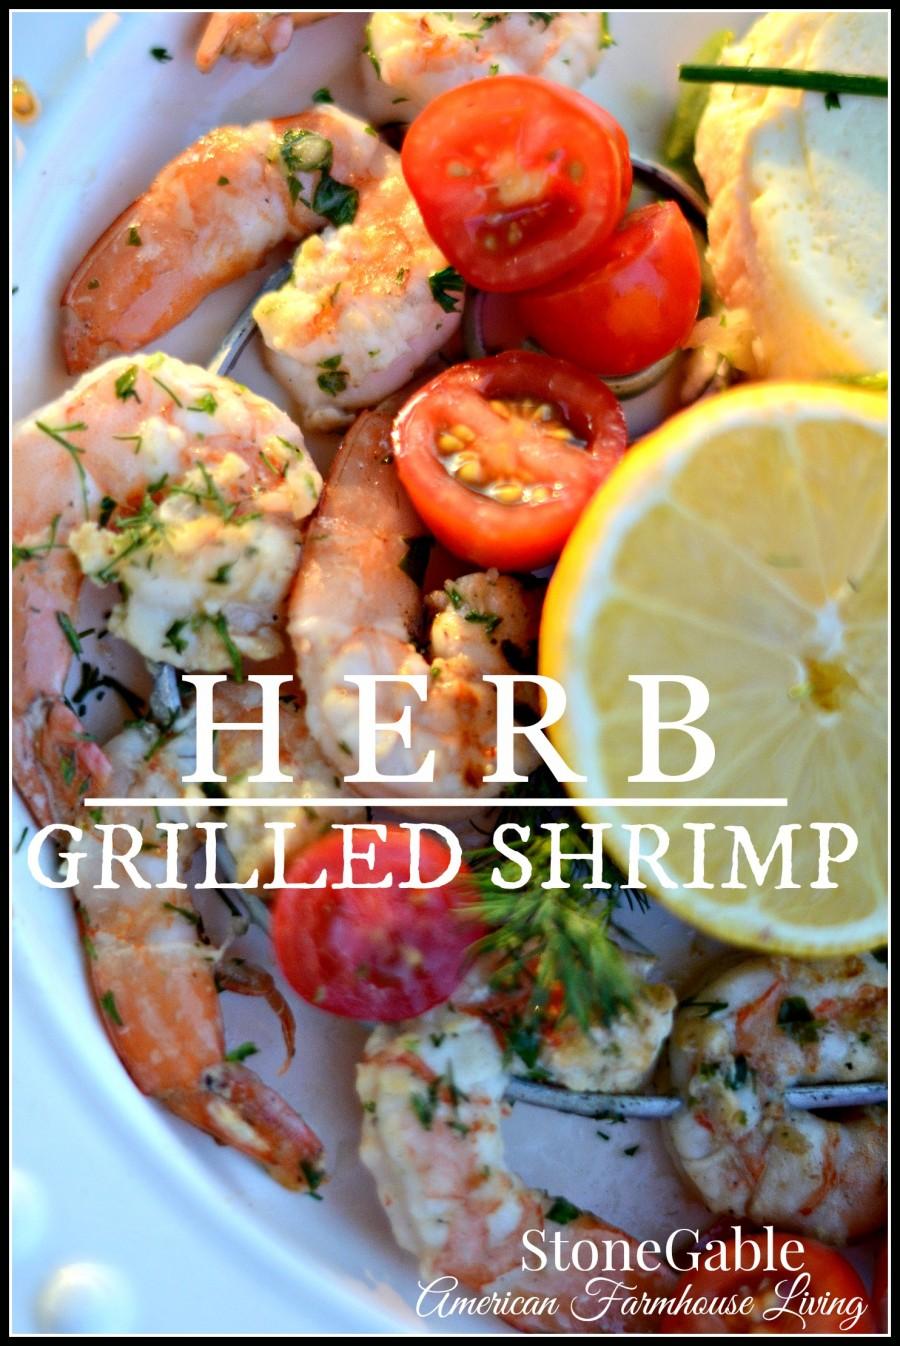 HERB GRILLED SHRIMP-easy and scrumptious-stonegableblog.com